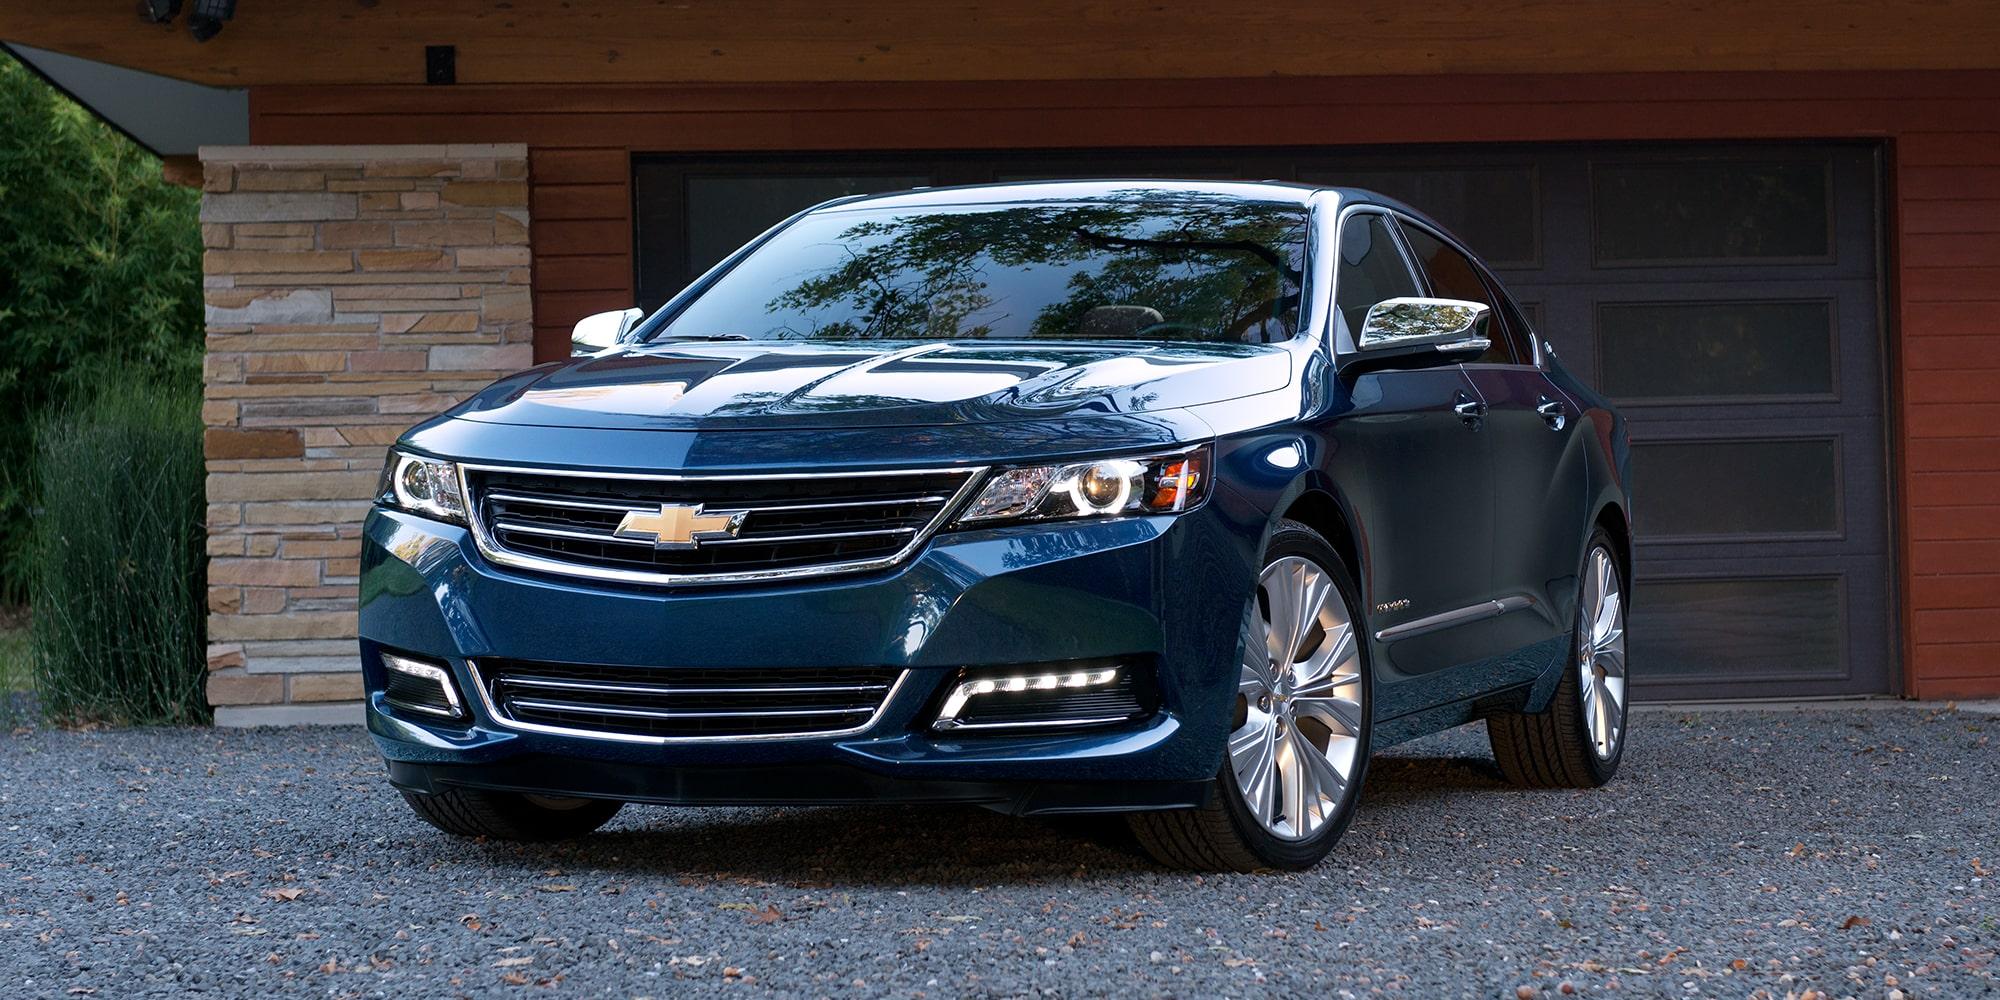 2018 Chevrolet Impala Full Size Car